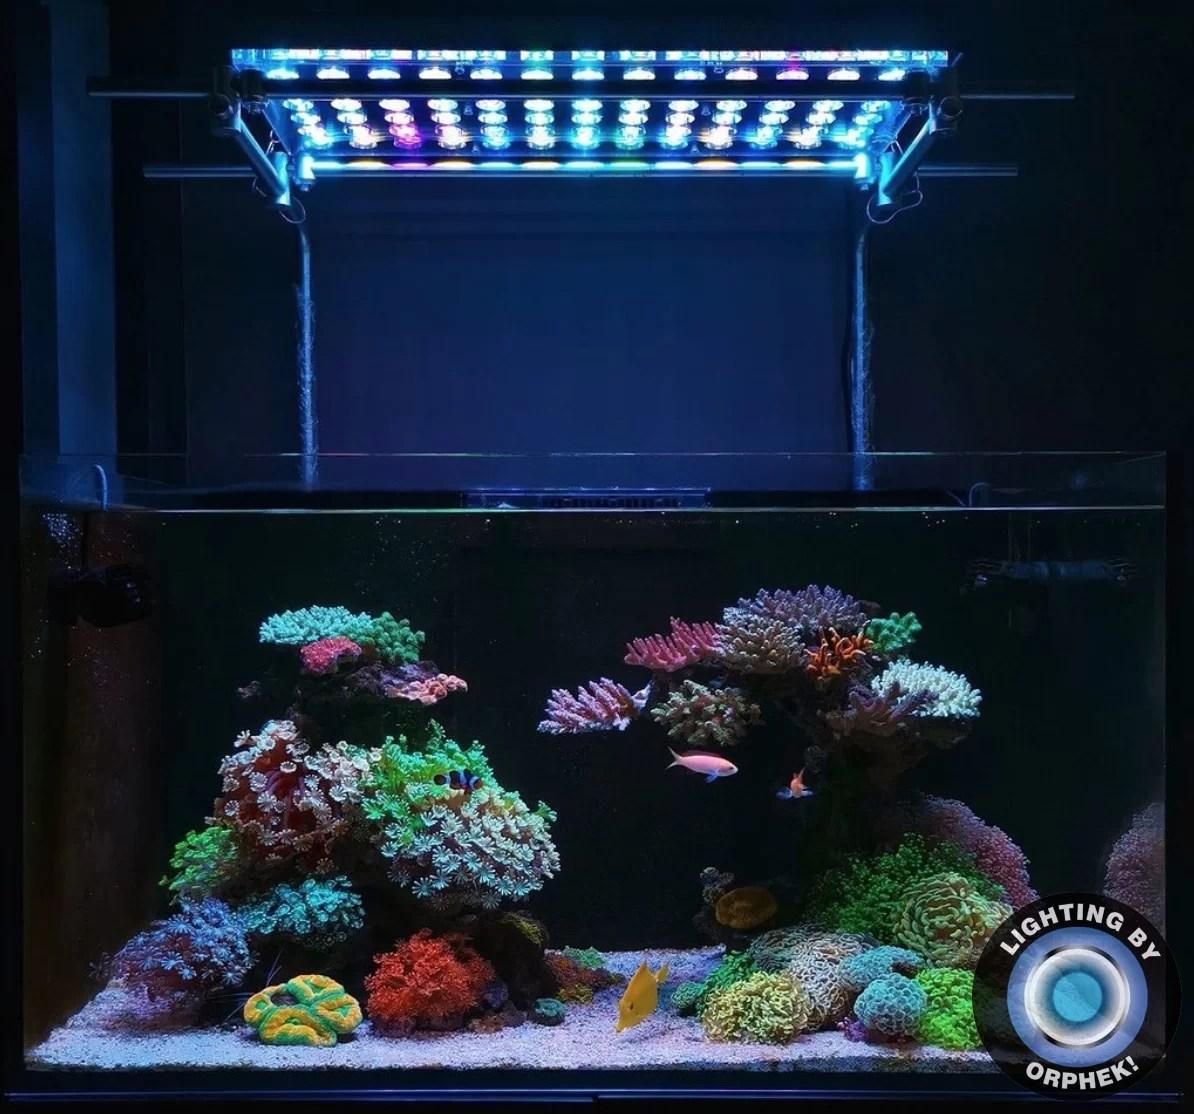 Atlantik V4 Reef Aquarium Led Beleuchtung Orphek Leds Lichter